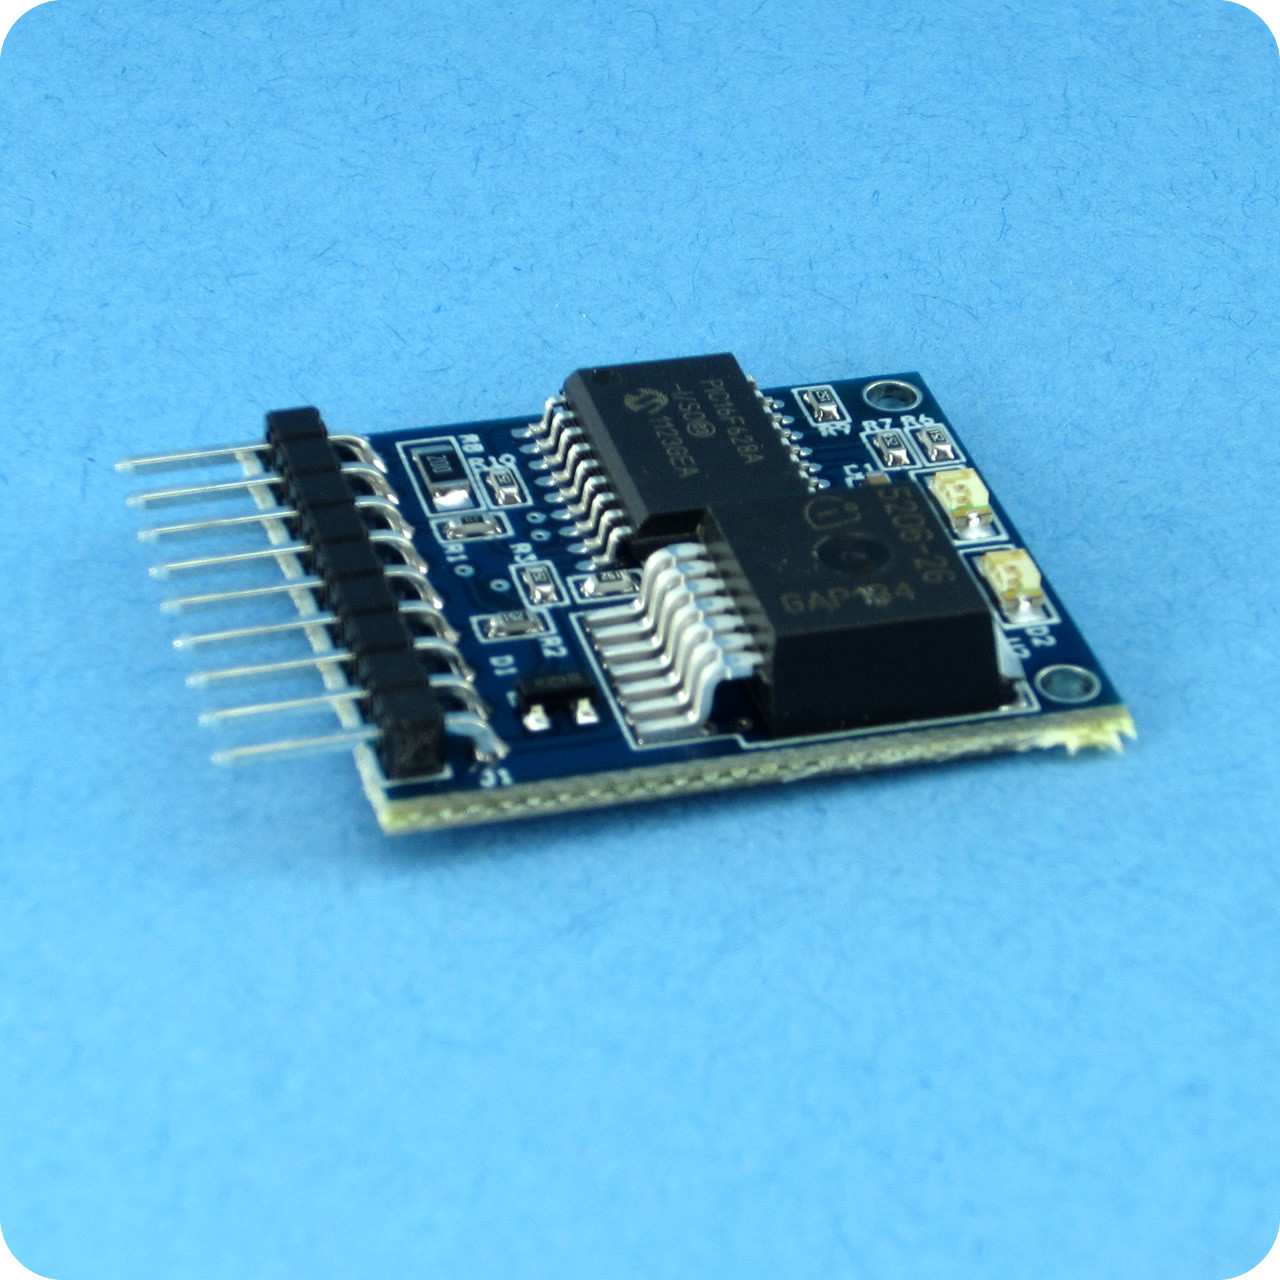 Motor Mind B 6 24vdc 2a Dc Controller Solutions Cubed Llc Power Opamp Servo Amplifier Tachometer Speed Control Larger More Photos